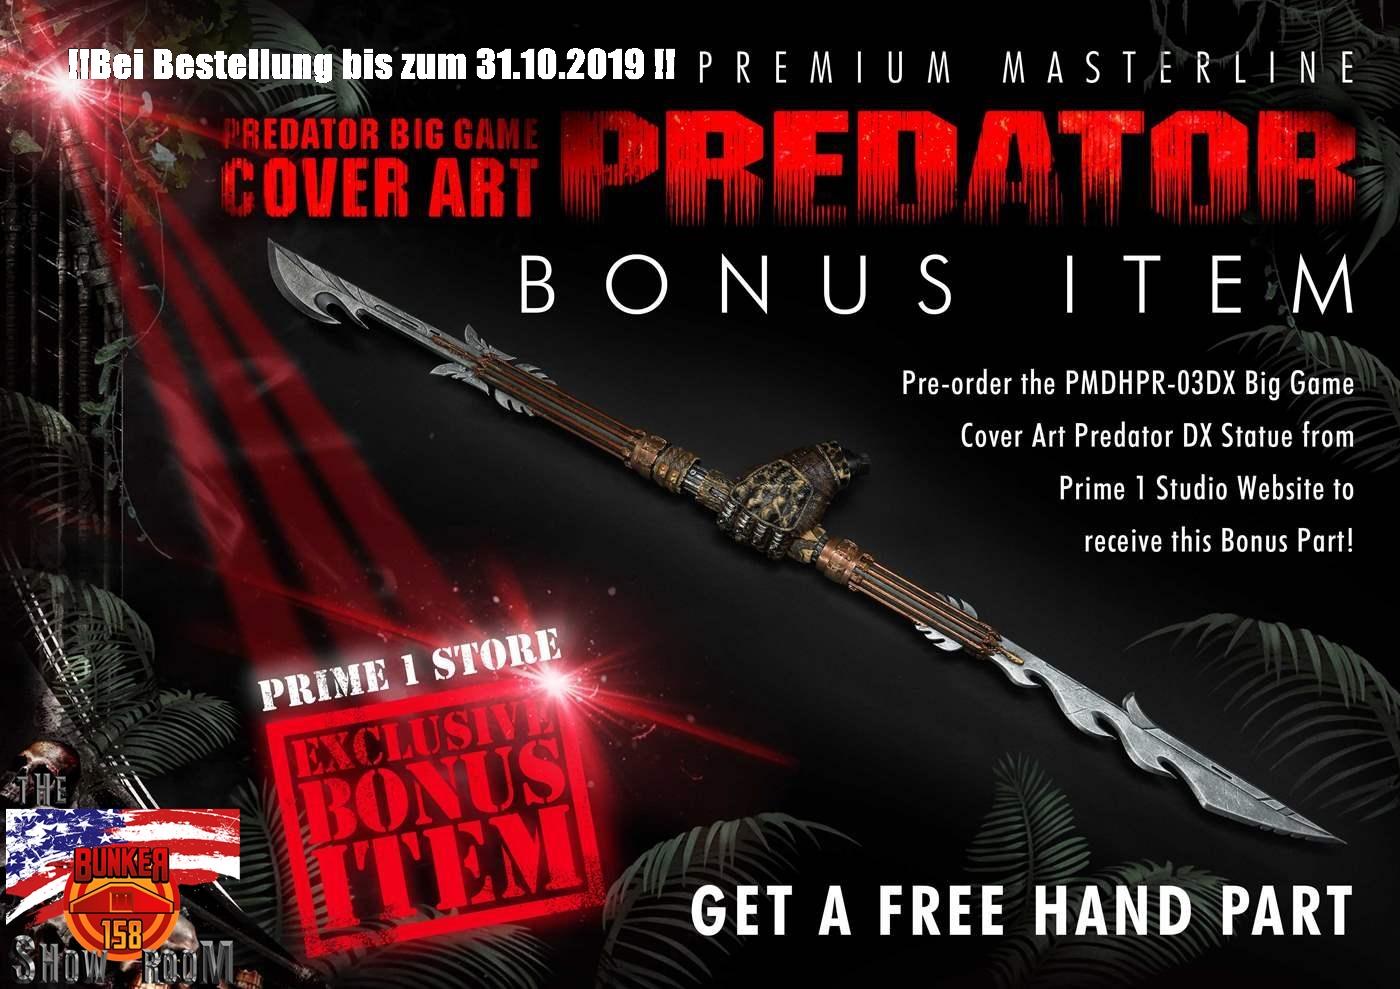 Predator (Comics) Big Game Cover Art Predator Deluxe Version